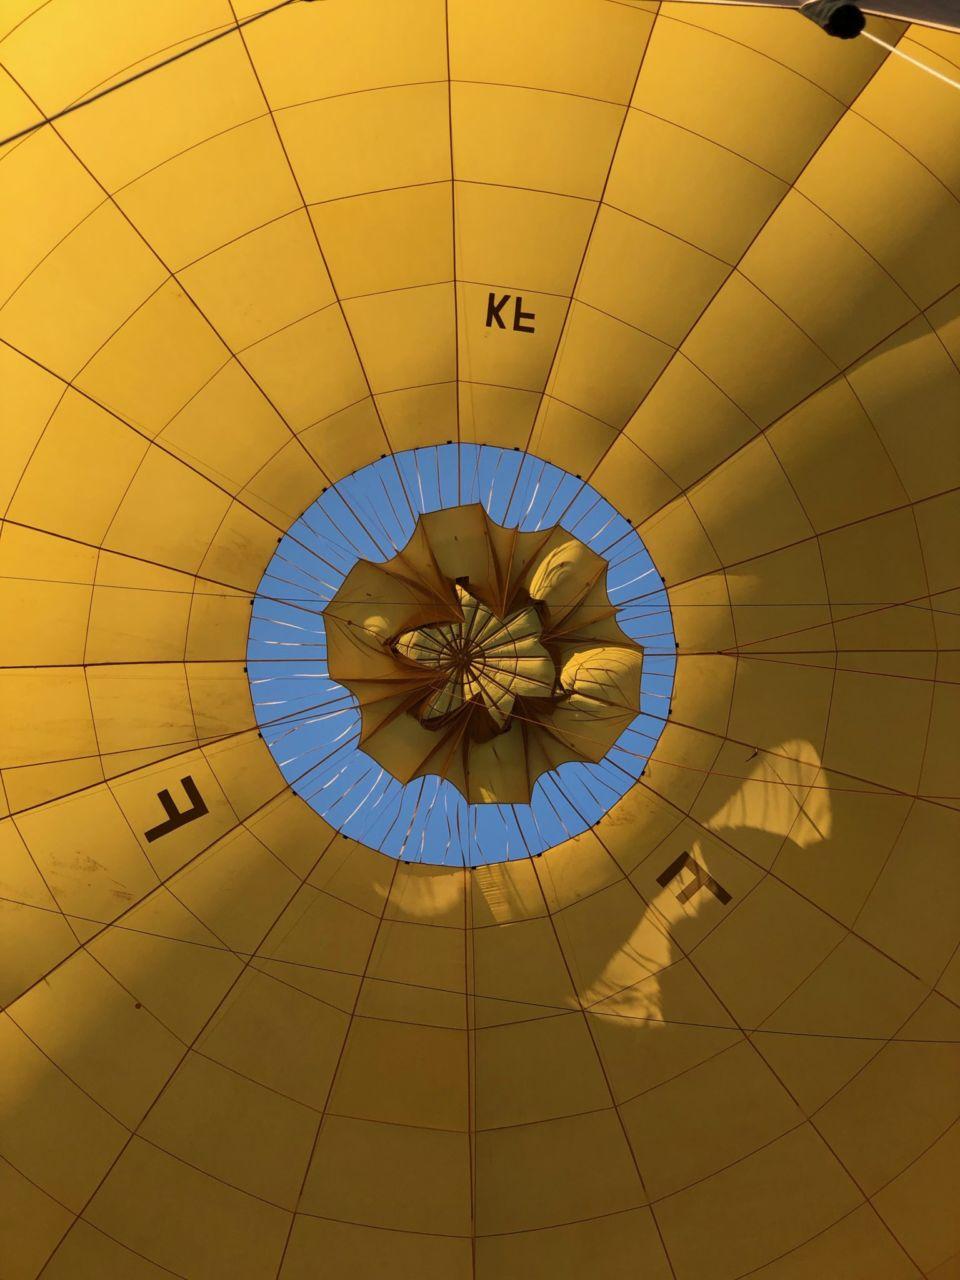 Gelber Ballon mit geöffnetem Segel